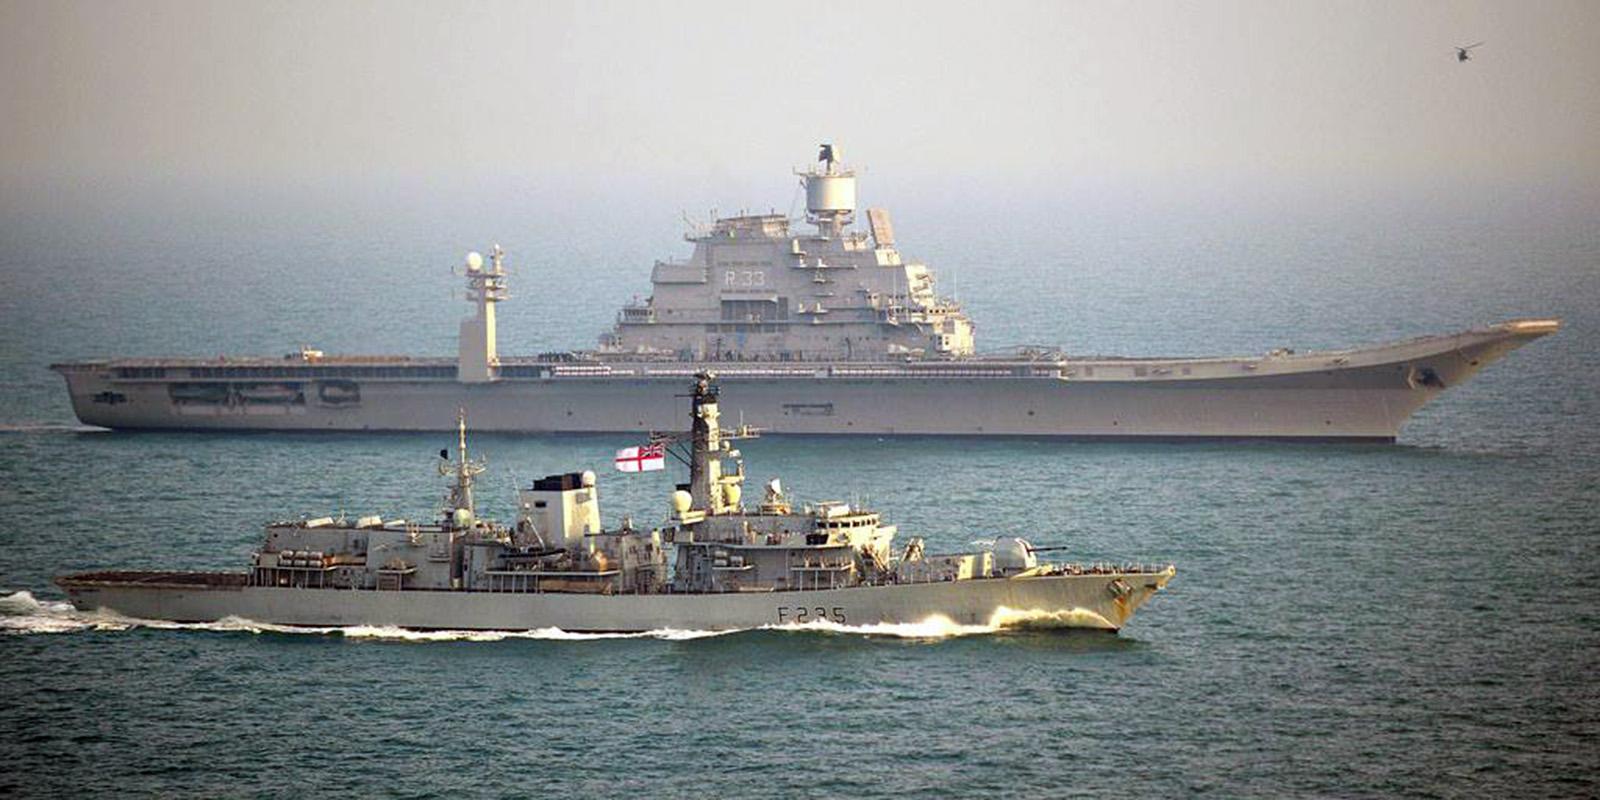 HMS Monmouth escorts INS Vikramaditya